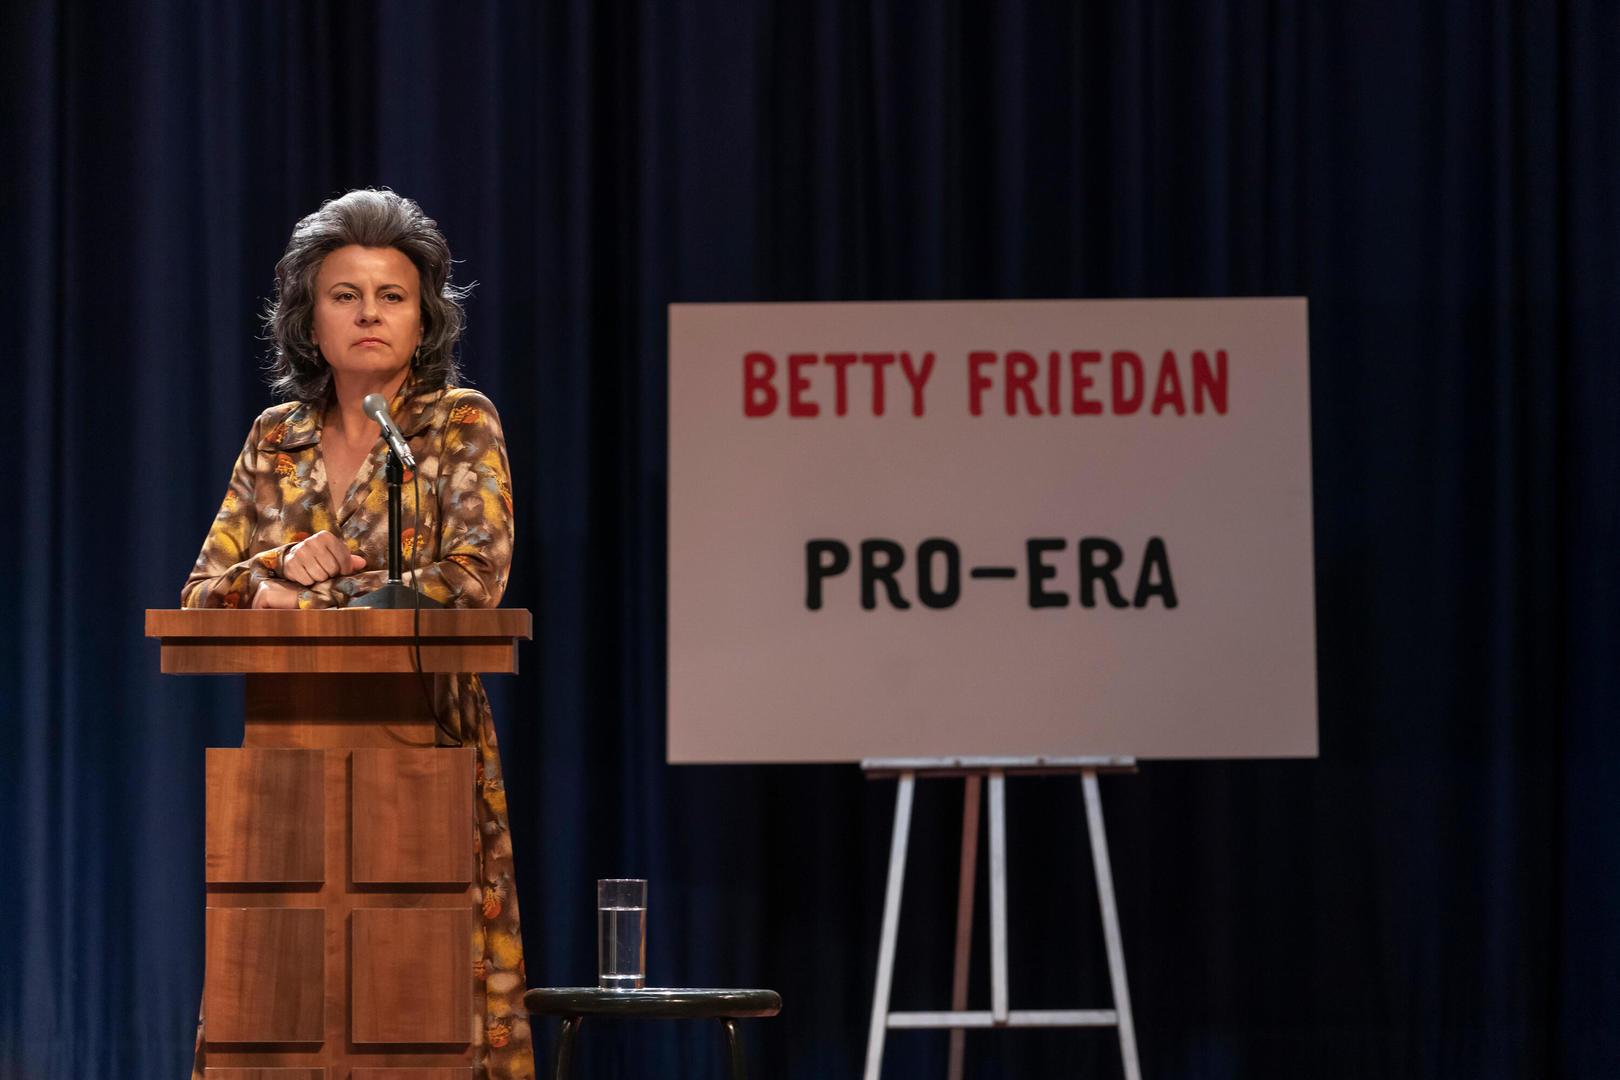 Tracey Ullman as Betty Friedan in 'Mrs. America' (photo: Hulu)